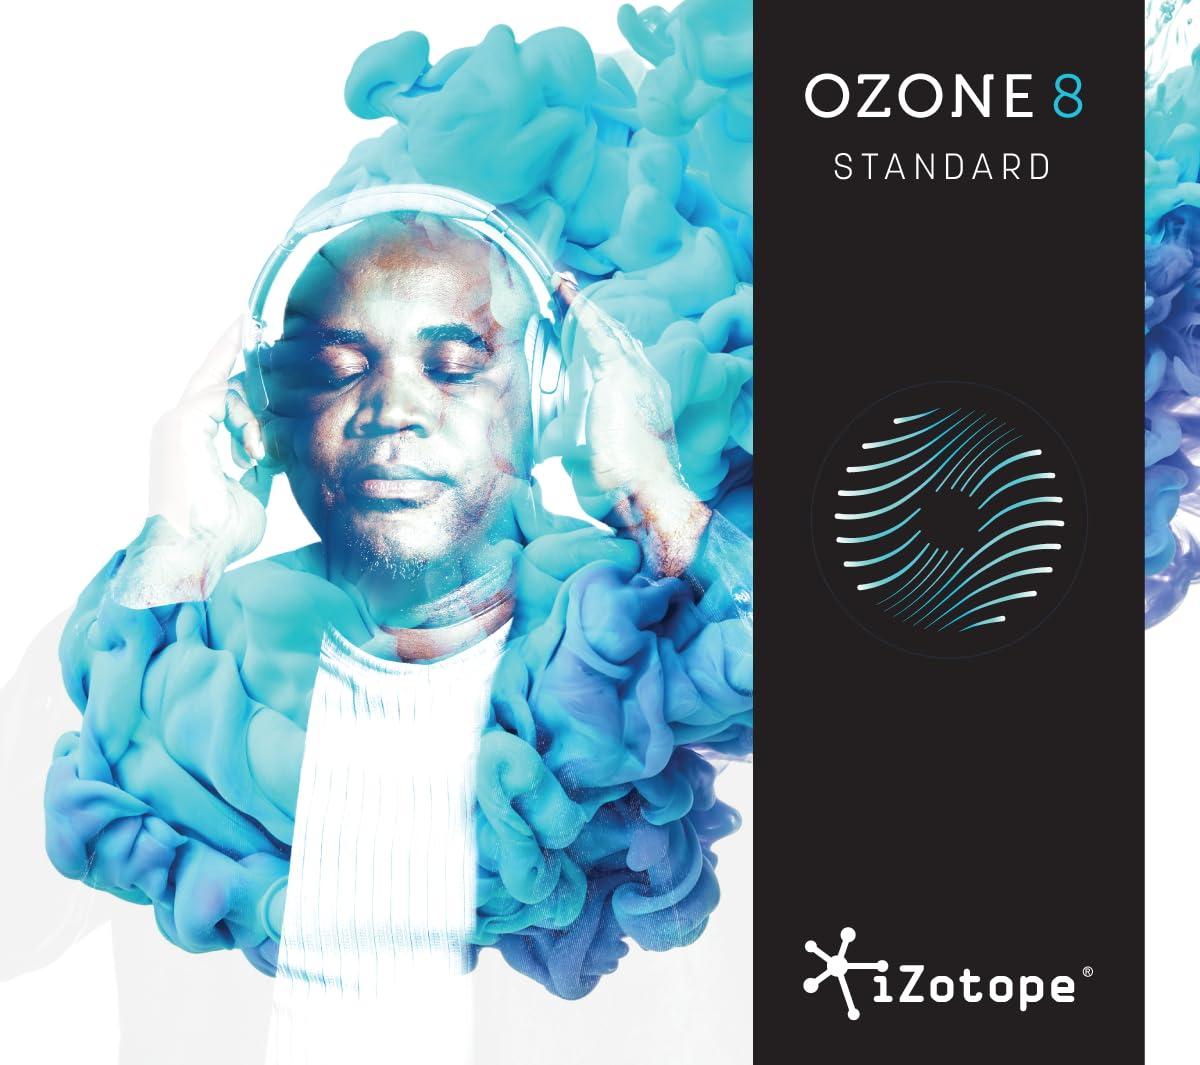 Ozone 8 Milwaukee Mall Standard: Mastering iZotope Plug-in Code mart Online